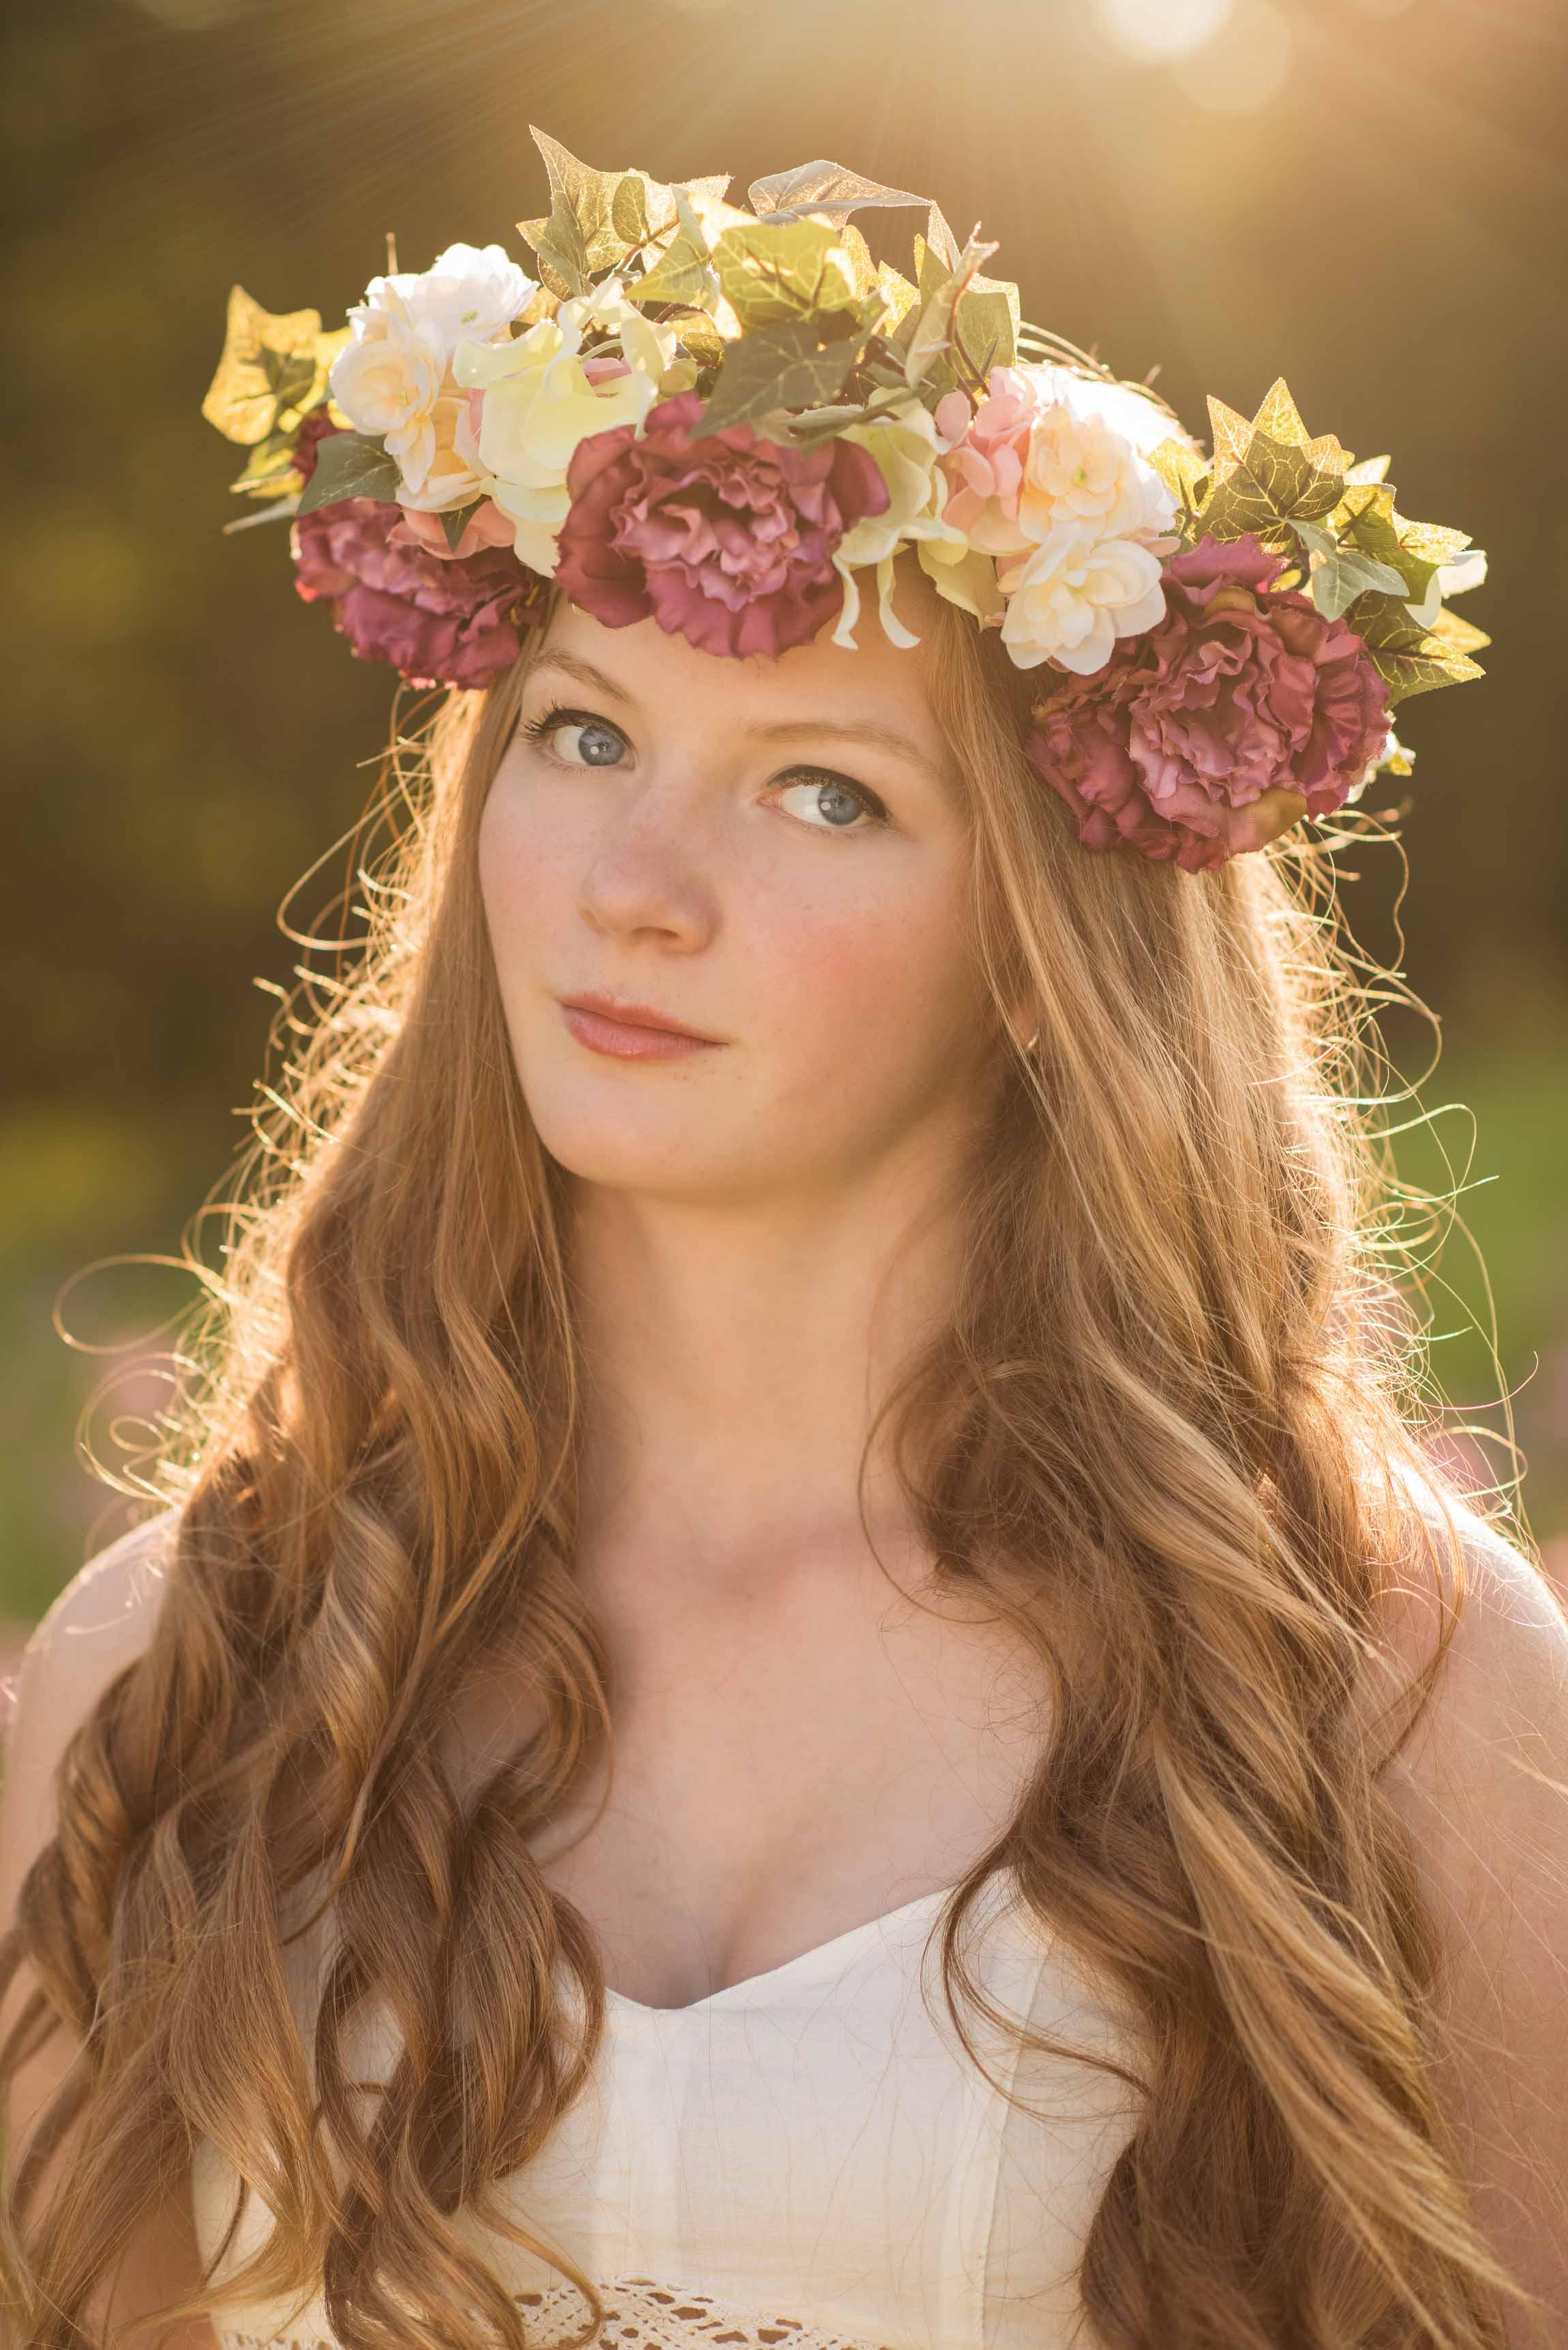 Rebecca Lappa GigCity Edmonton